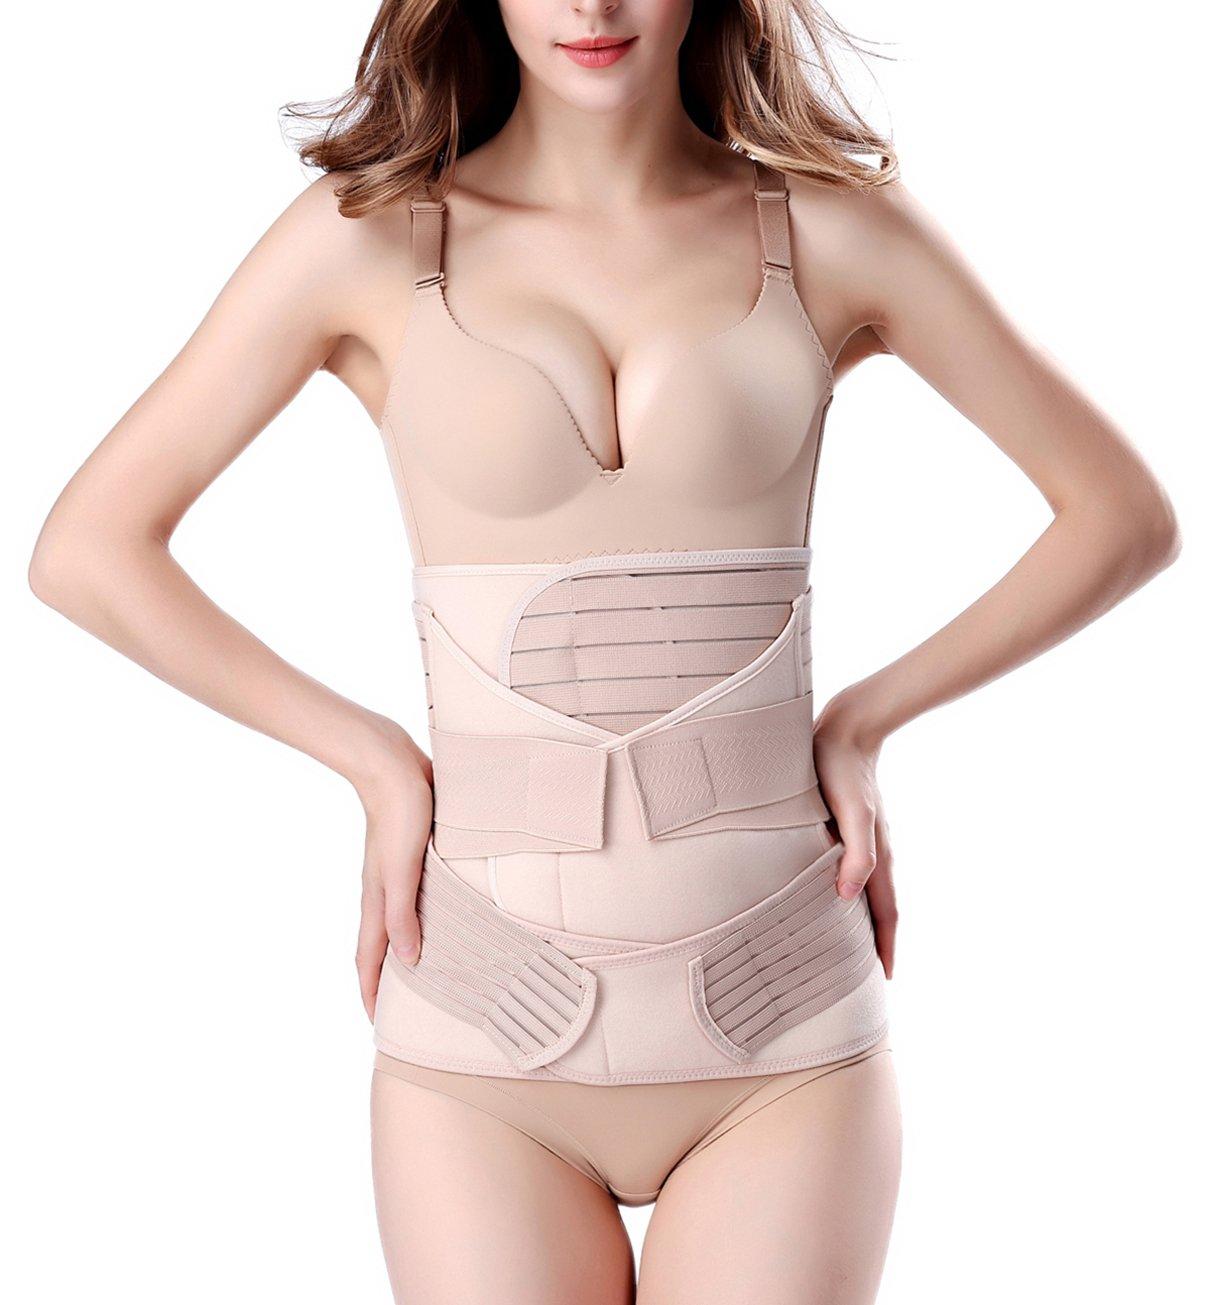 3 in 1 Postpartum Support - Recovery Belly/waist/pelvis Belt Shapewear Slimming Girdle, Beige, One Size